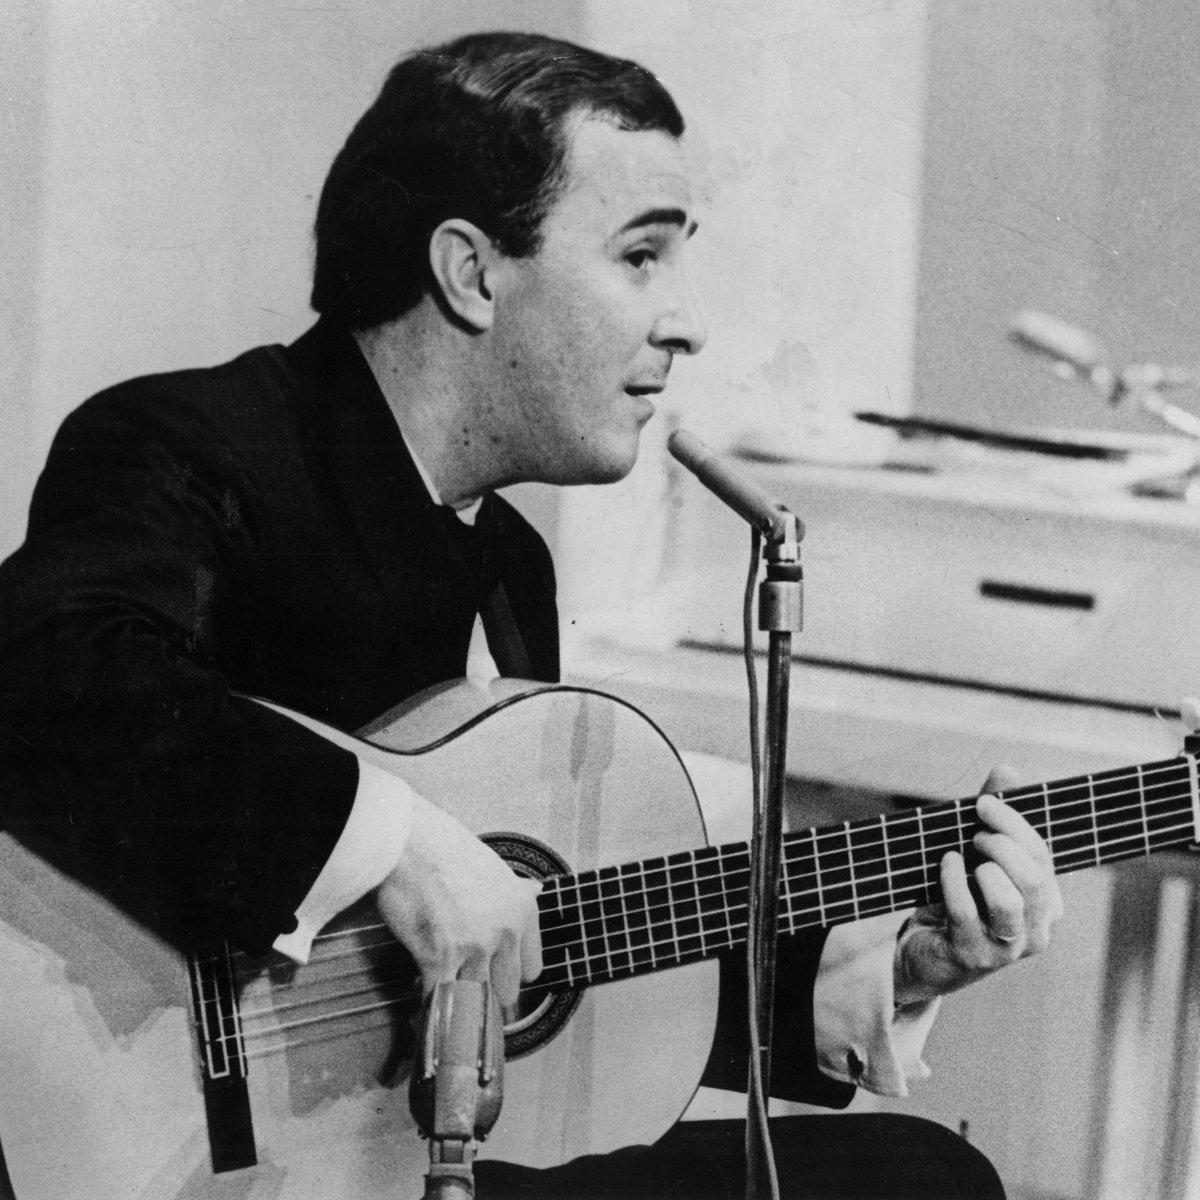 Há 60 anos, Bossa Nova transformava música brasileira